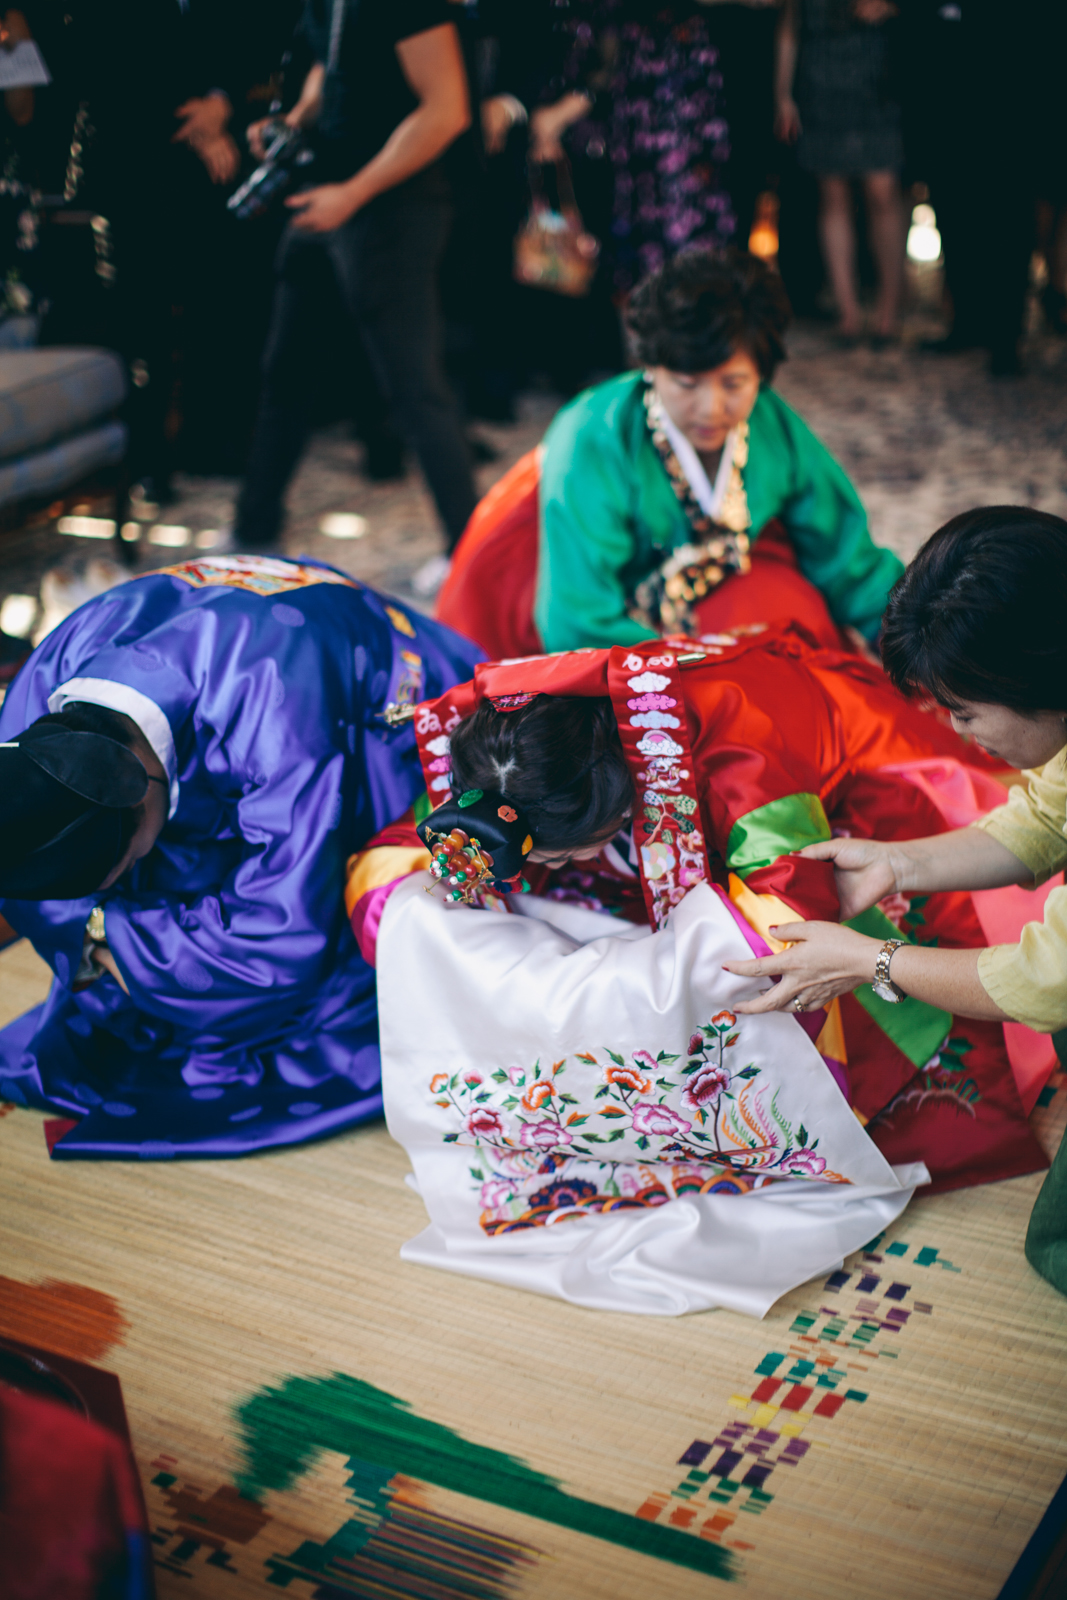 kohl_manison_wedding_photography_sarah_eric_ebony_siovhan_bokeh_photography_057.jpg